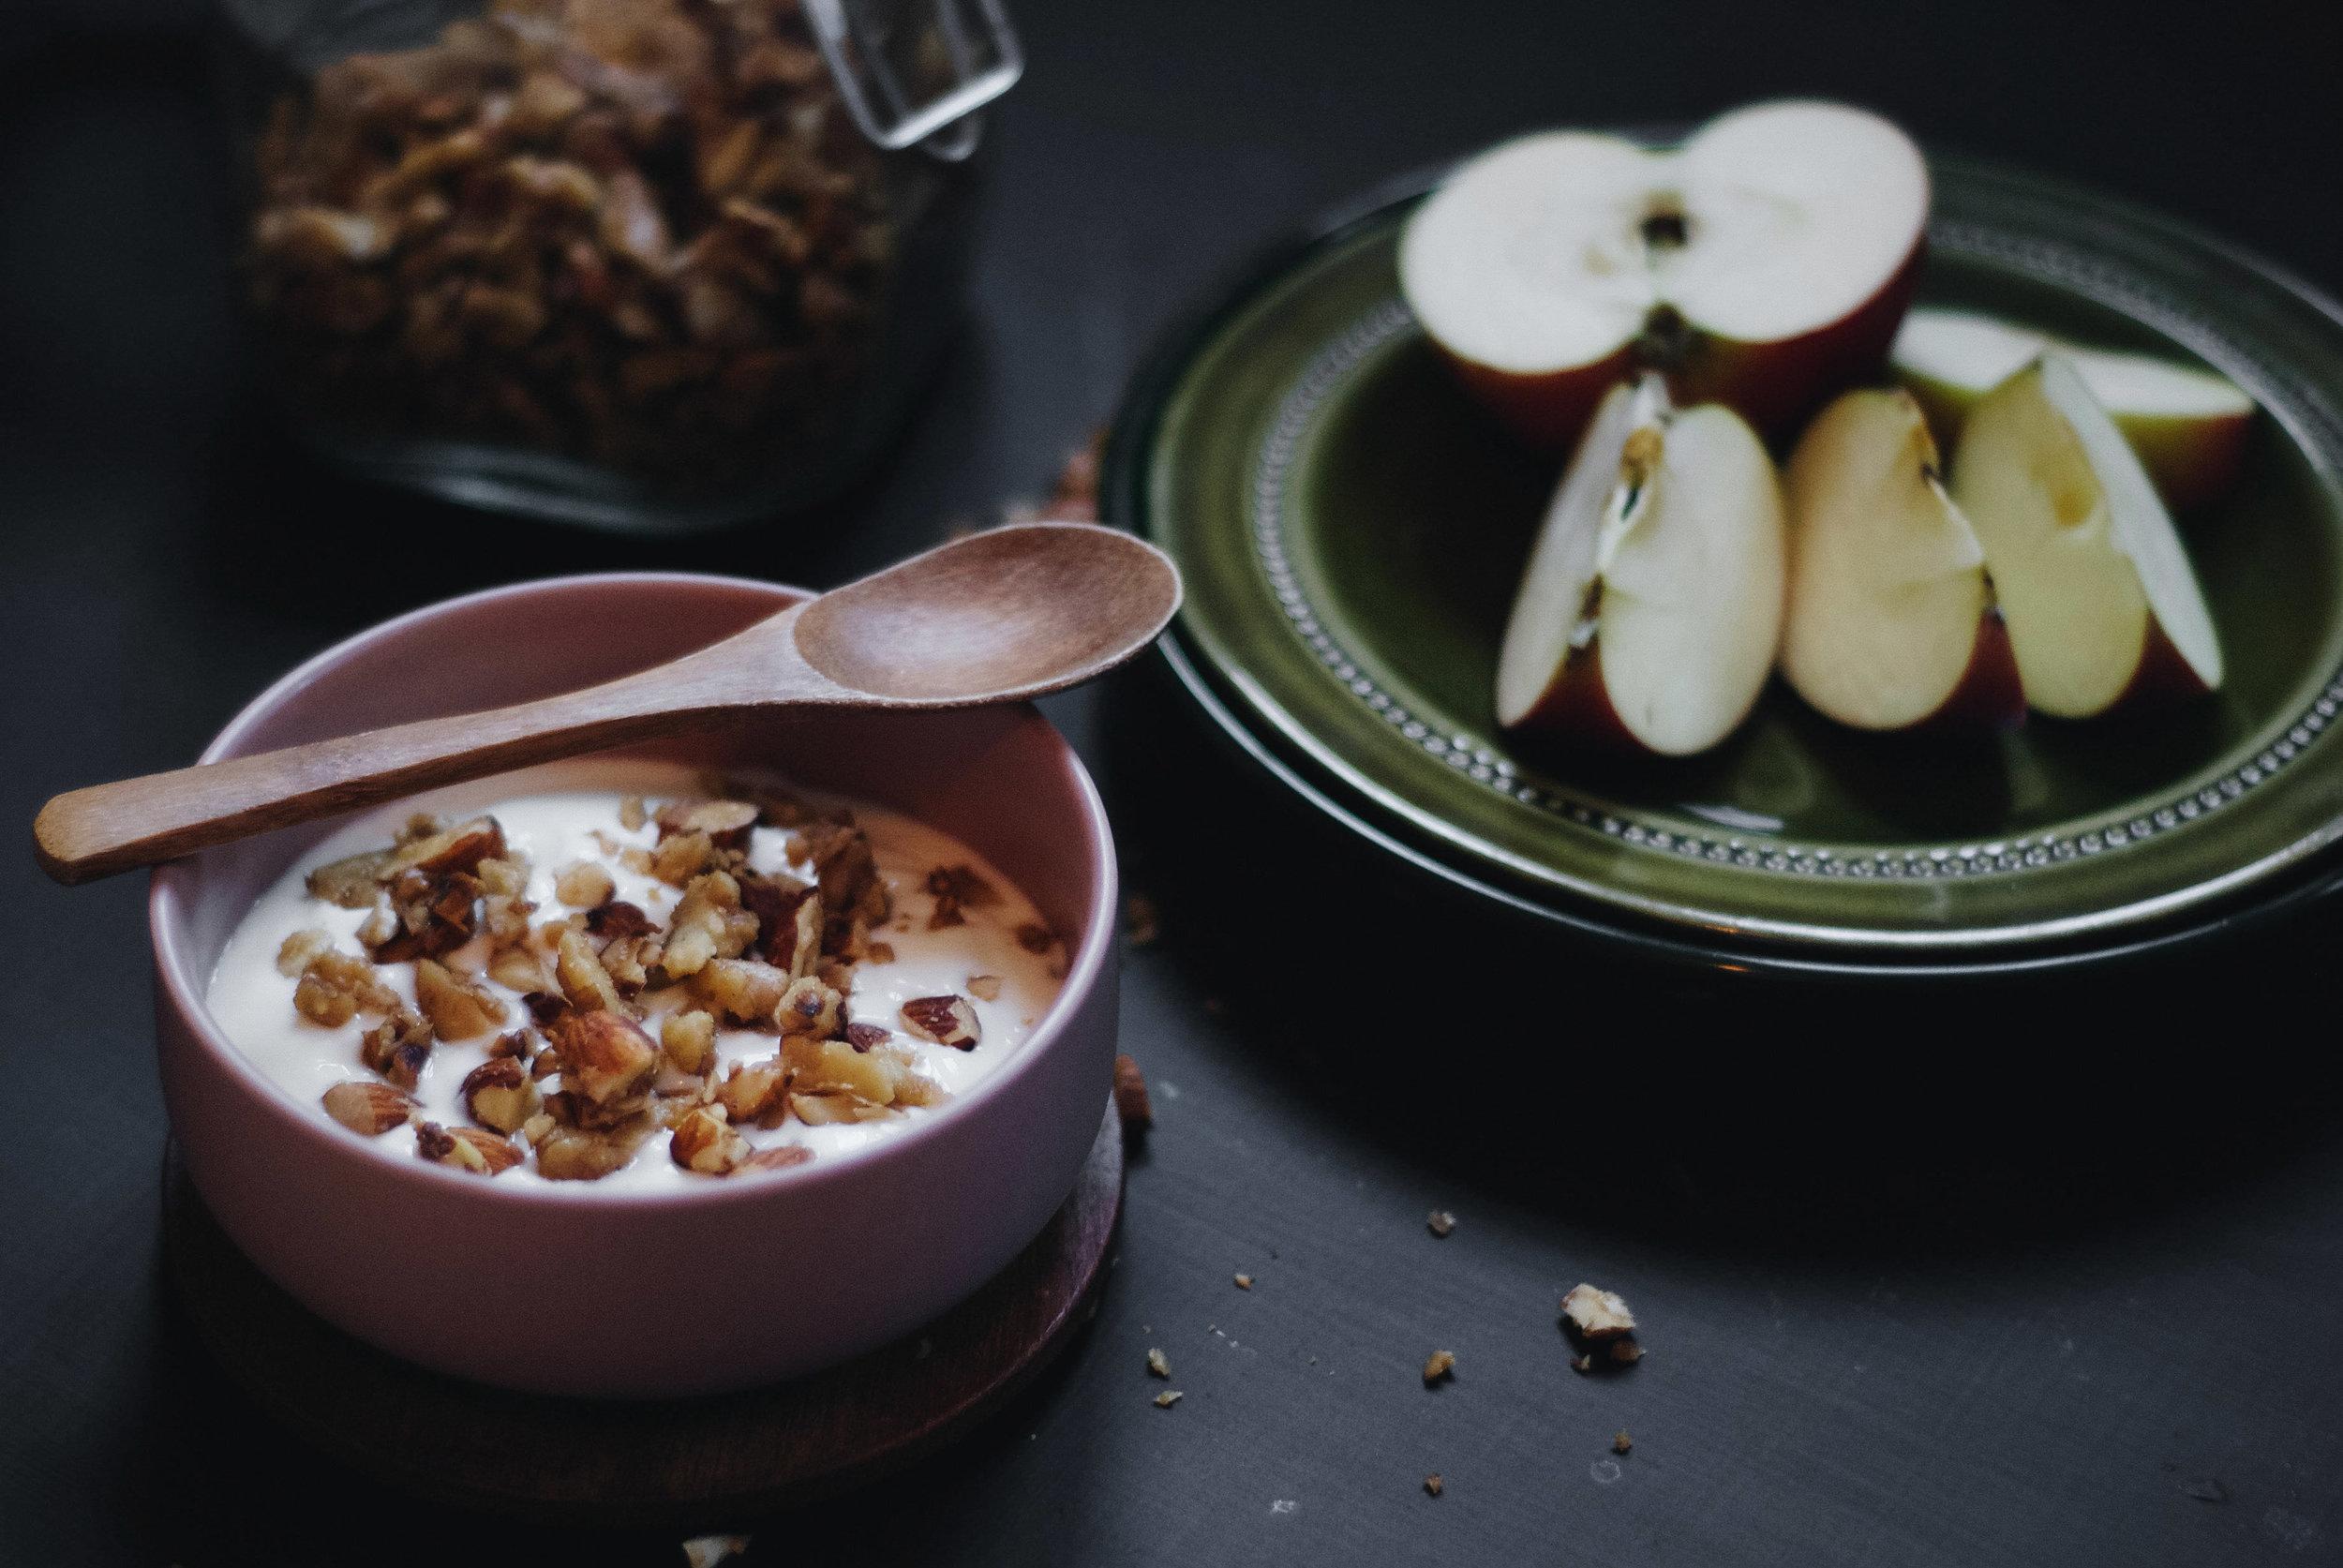 Nøtteblanding yoghurt eple